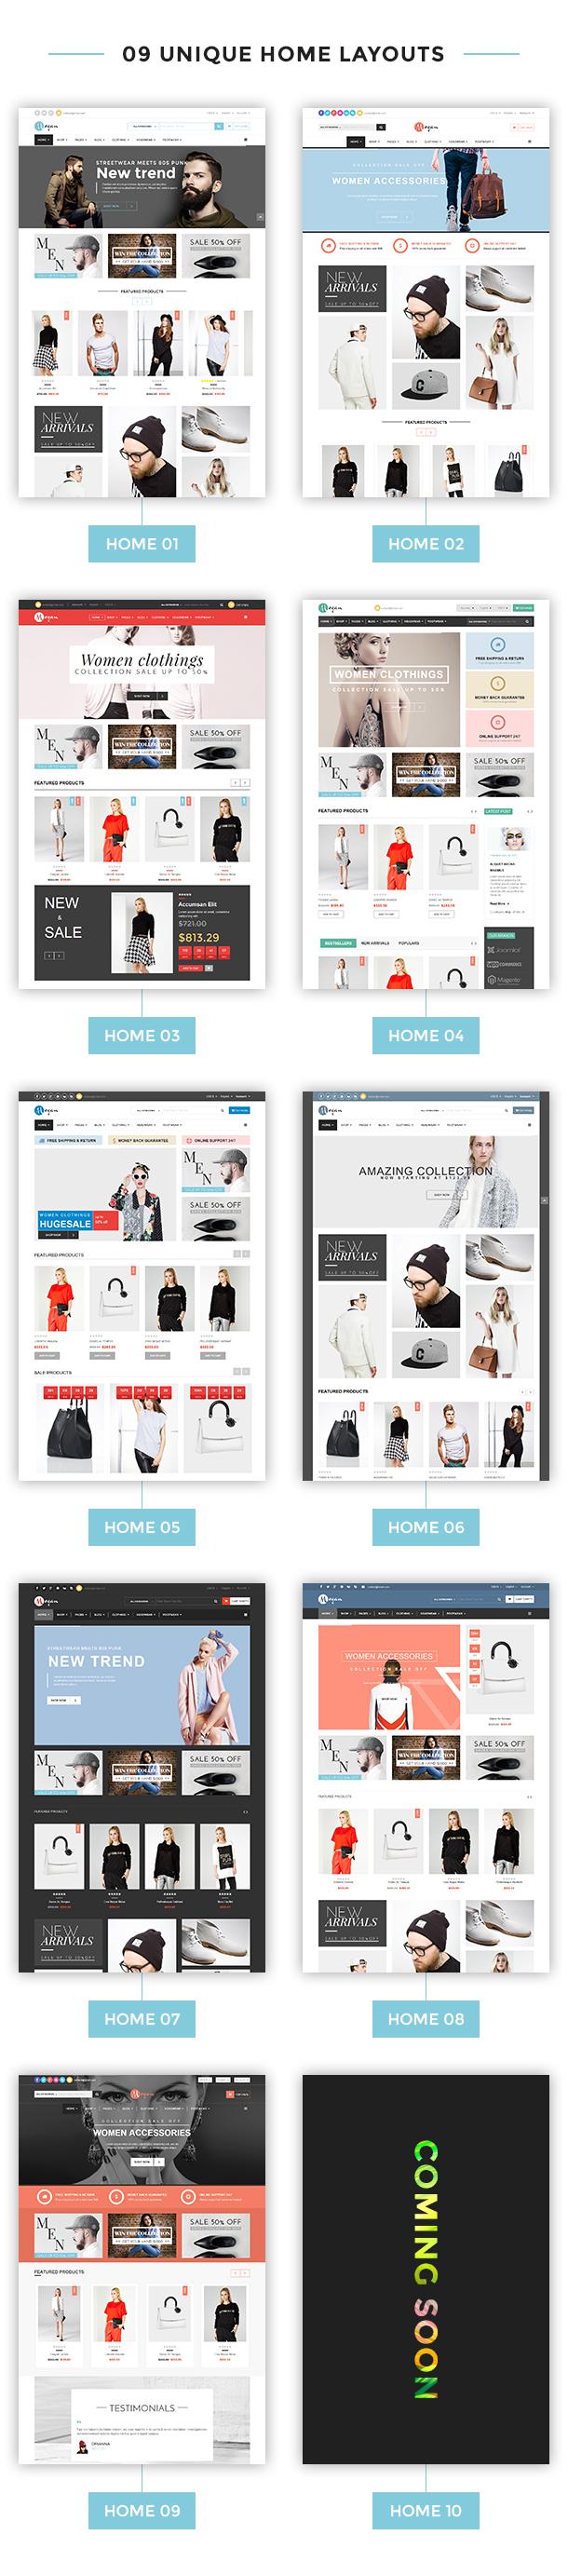 Vina Mogan - Responsive VirtueMart Fashion Template - 7